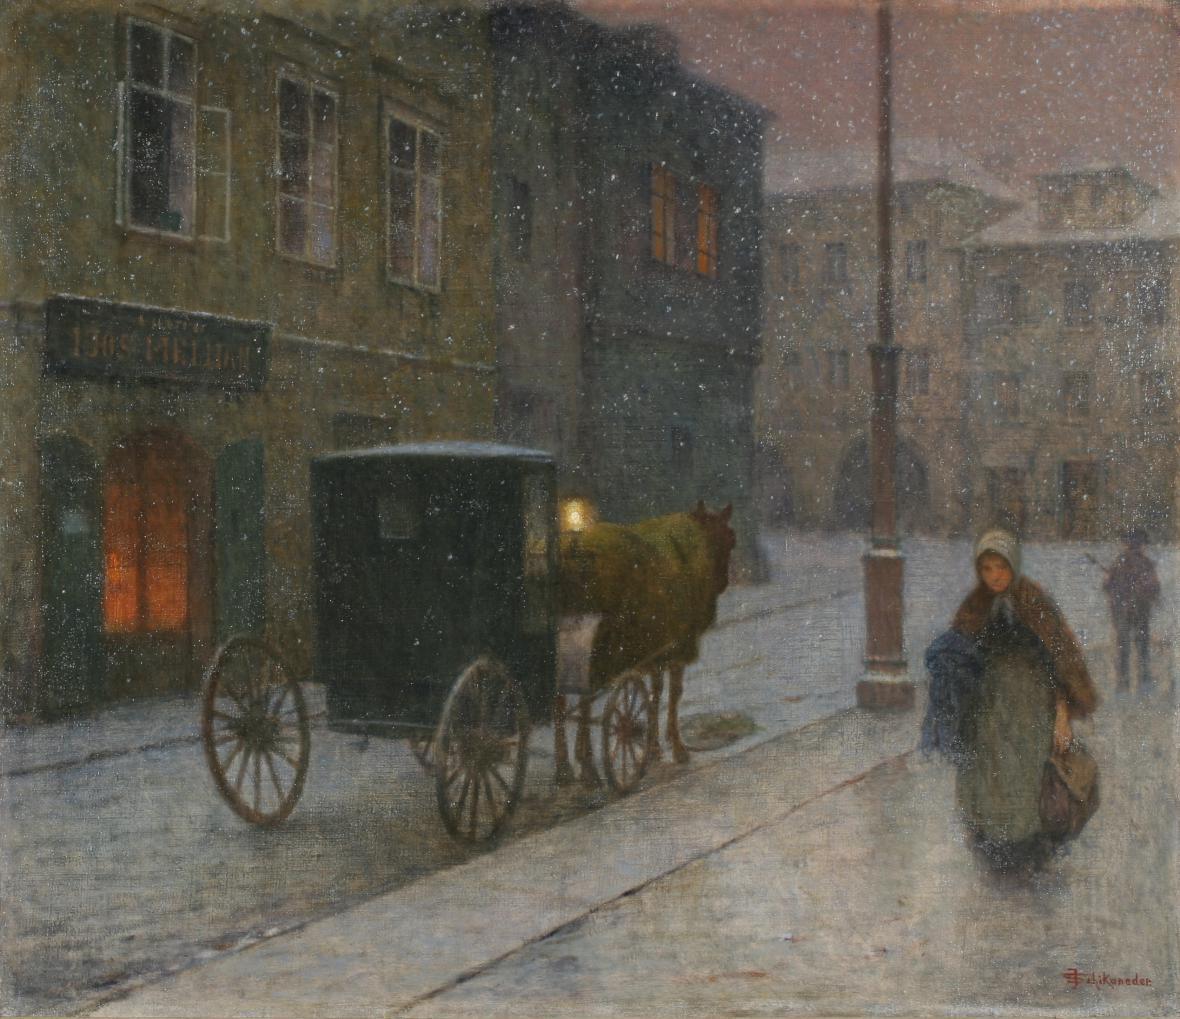 Jakub Schikaneder / Ulice s drožkou, 1900-1910